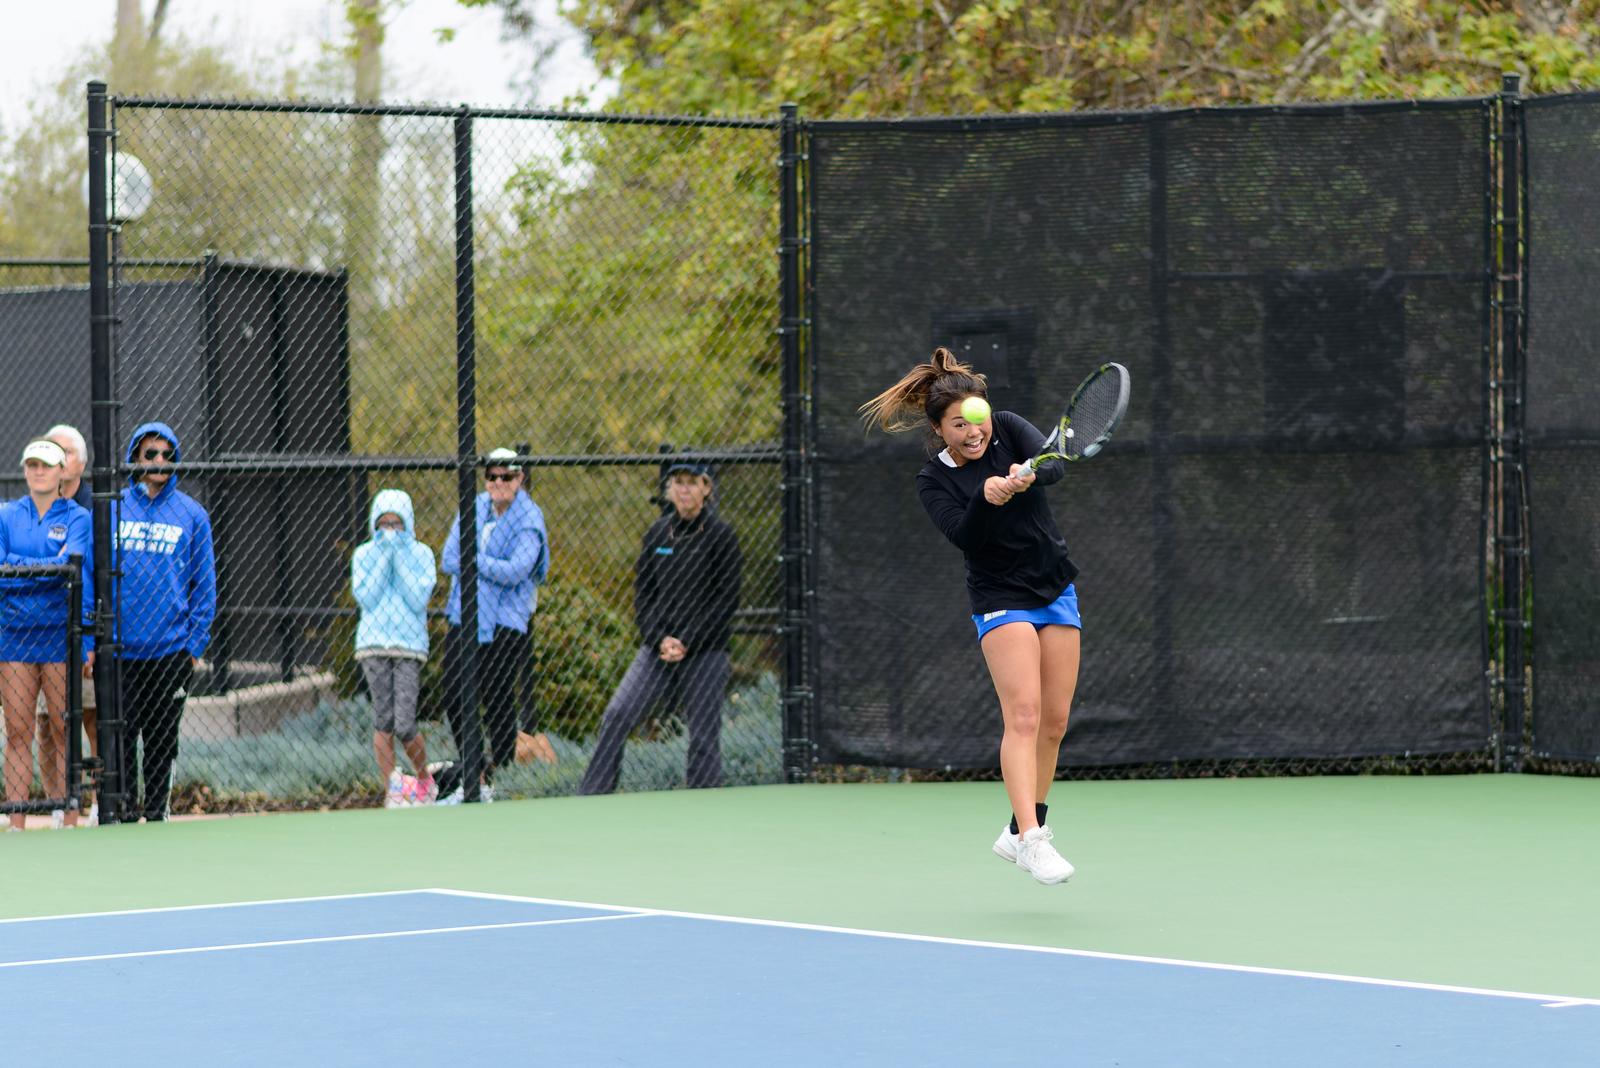 Stephanie Yamada jumps while swinging a solid backhand return.